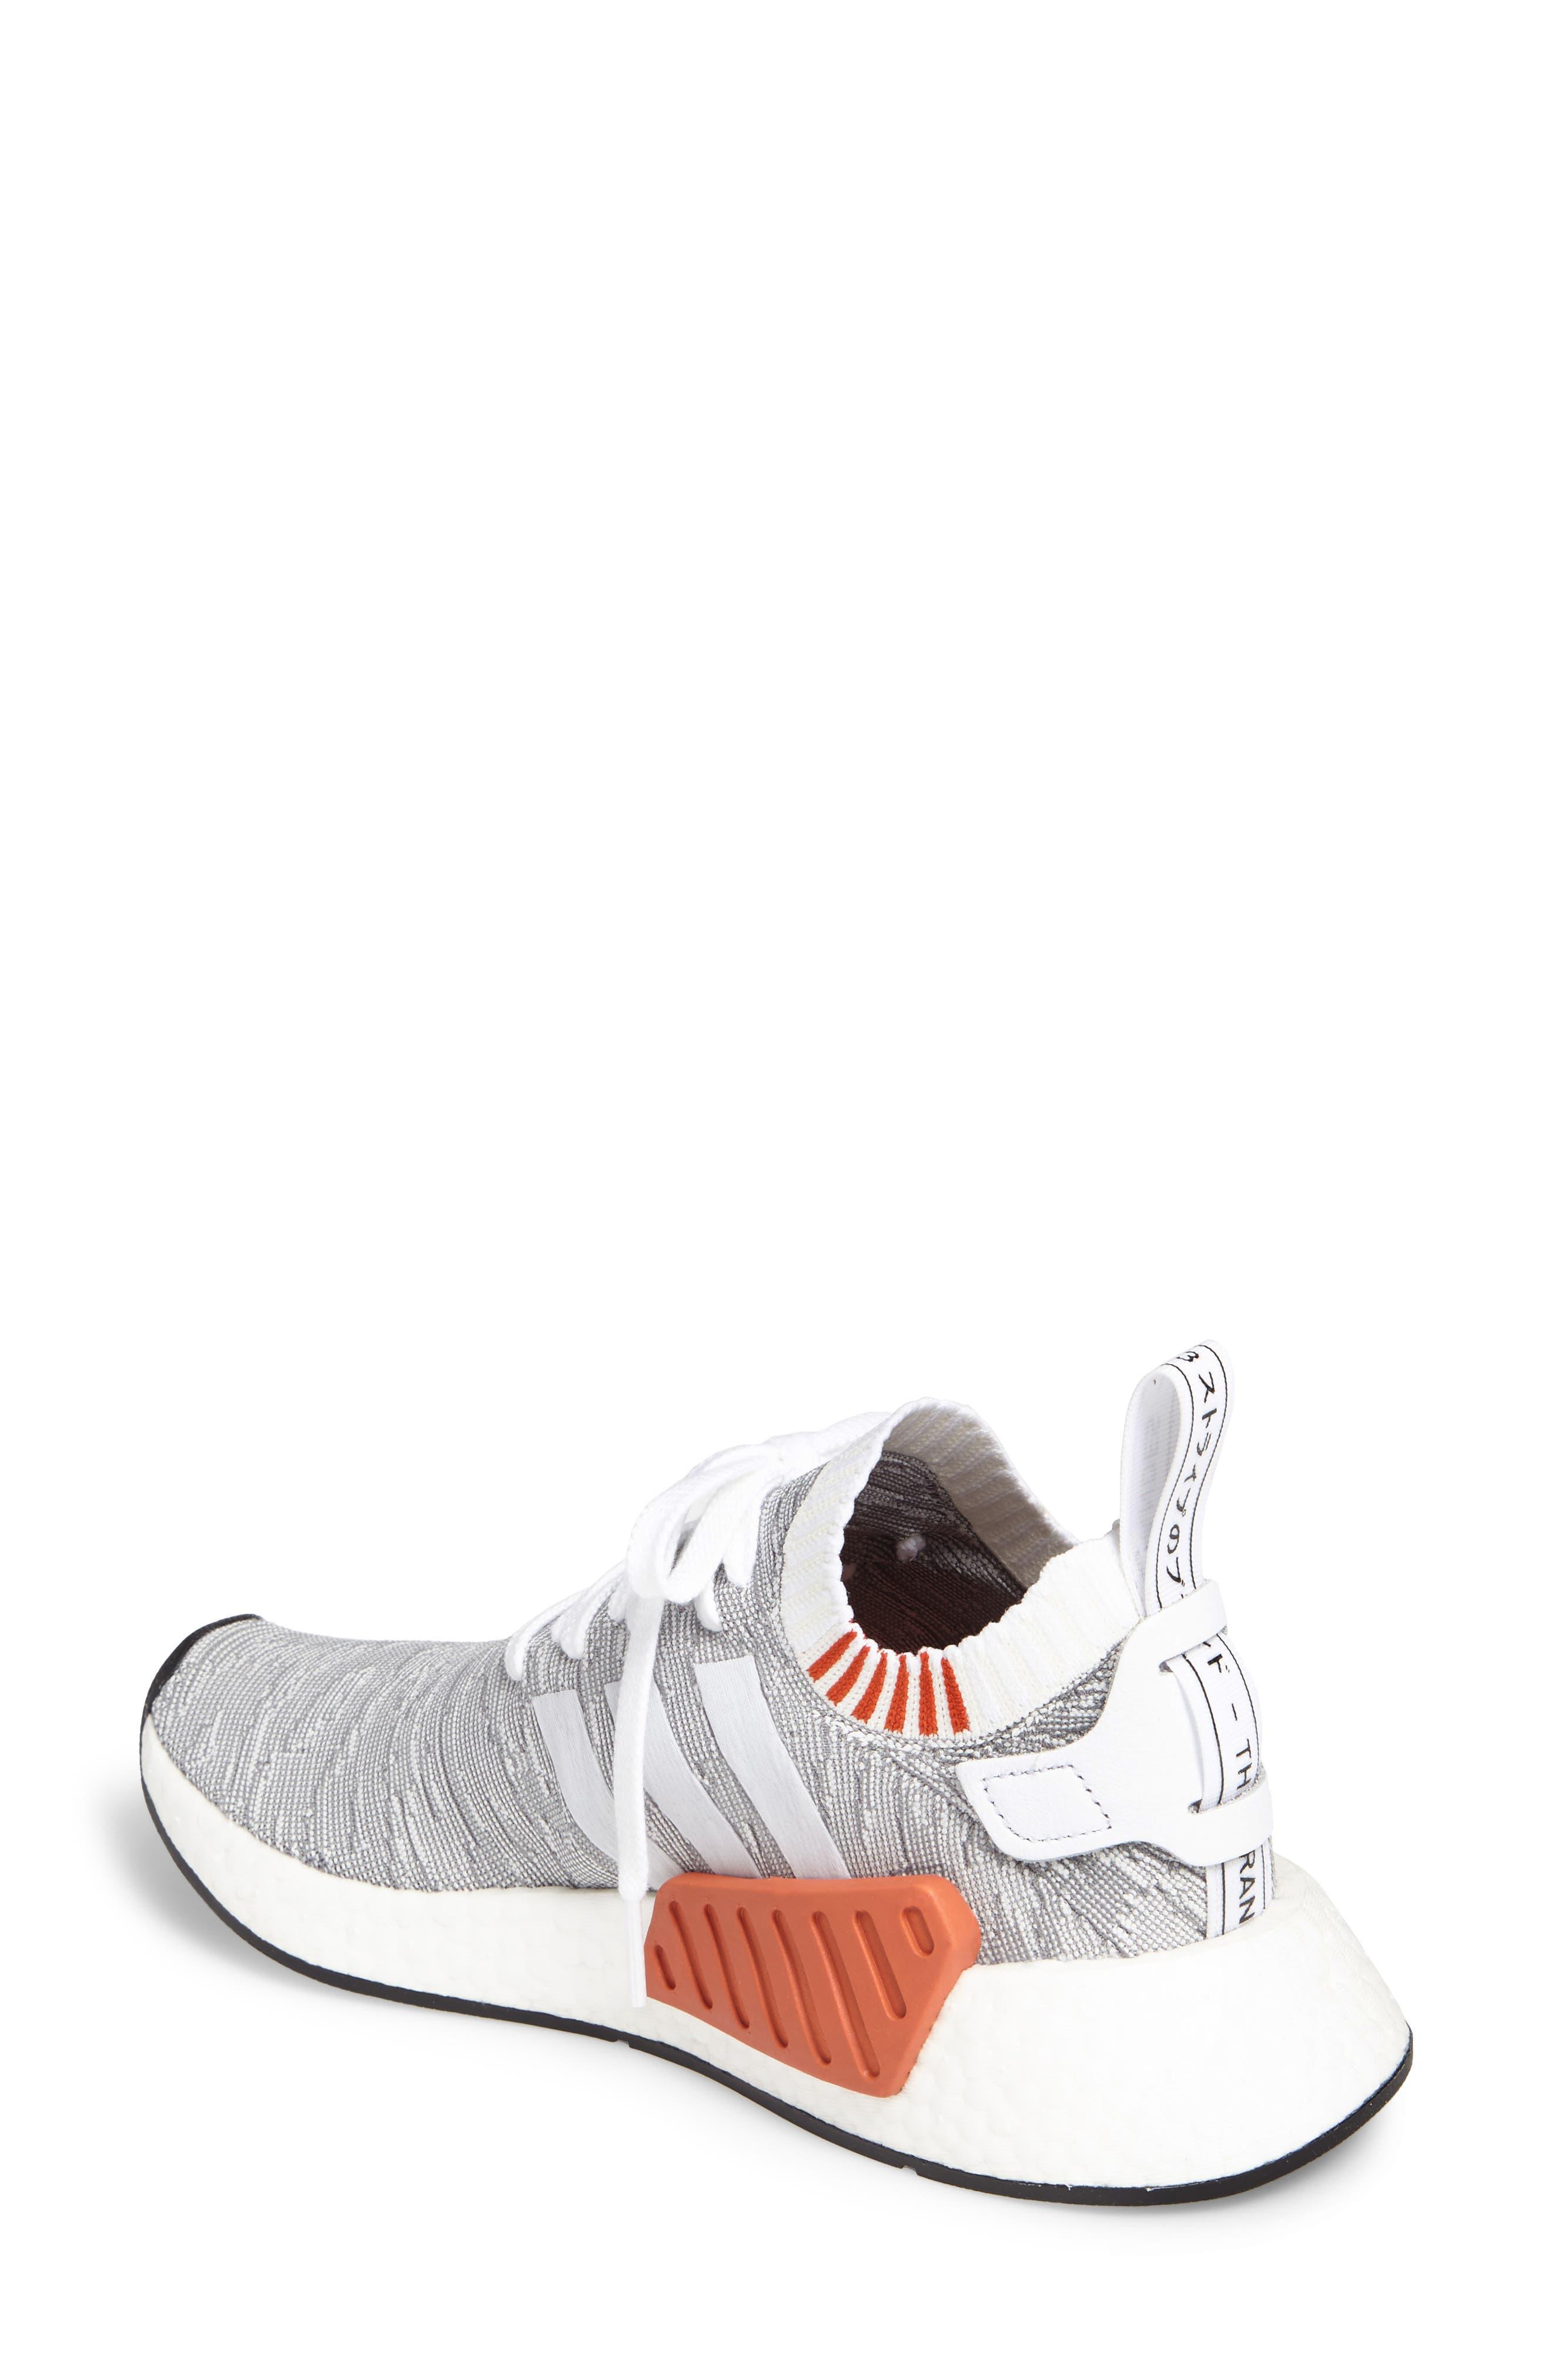 NMD R2 Primeknit Athletic Shoe,                             Alternate thumbnail 8, color,